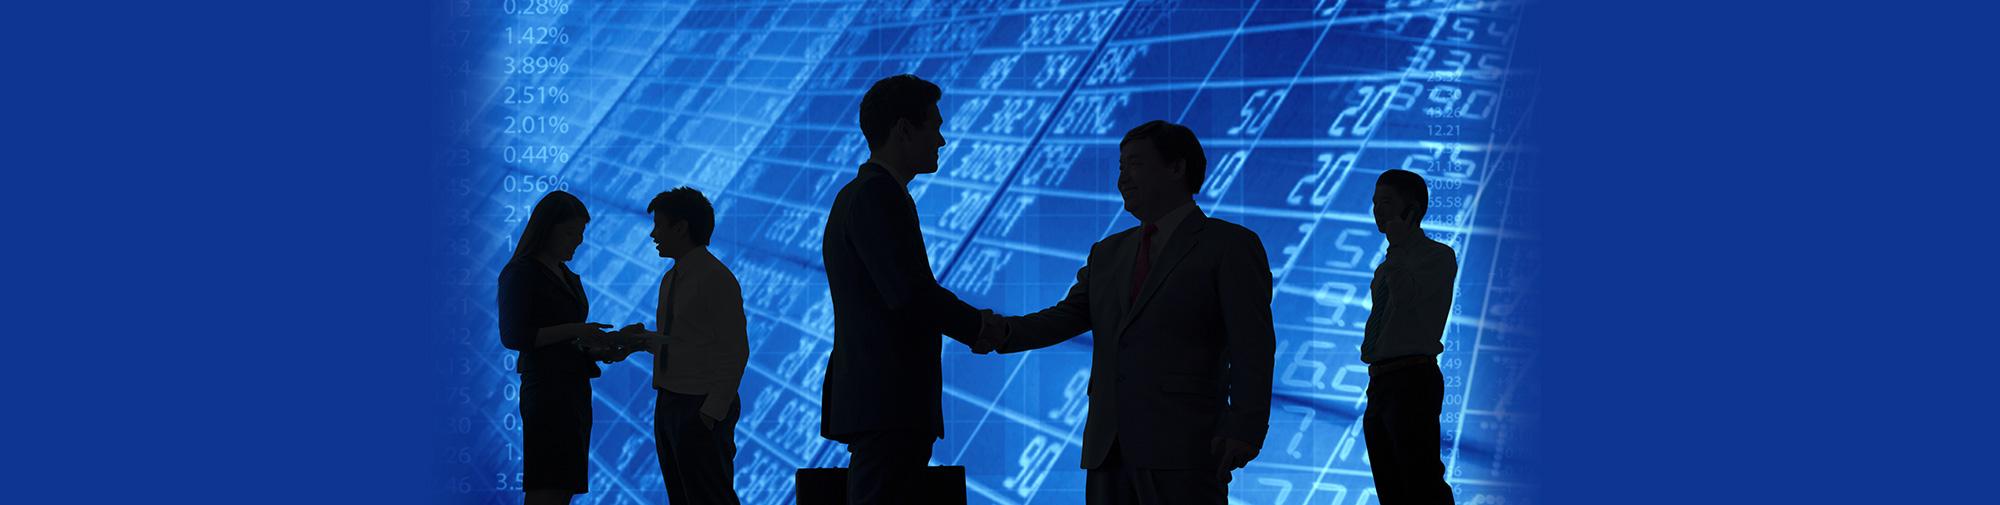 https://www.gekterna.com/userfiles/11e3ebfa-92f9-4083-8c5b-a26d00fe9b3c/Investor_Relations2_1.jpg